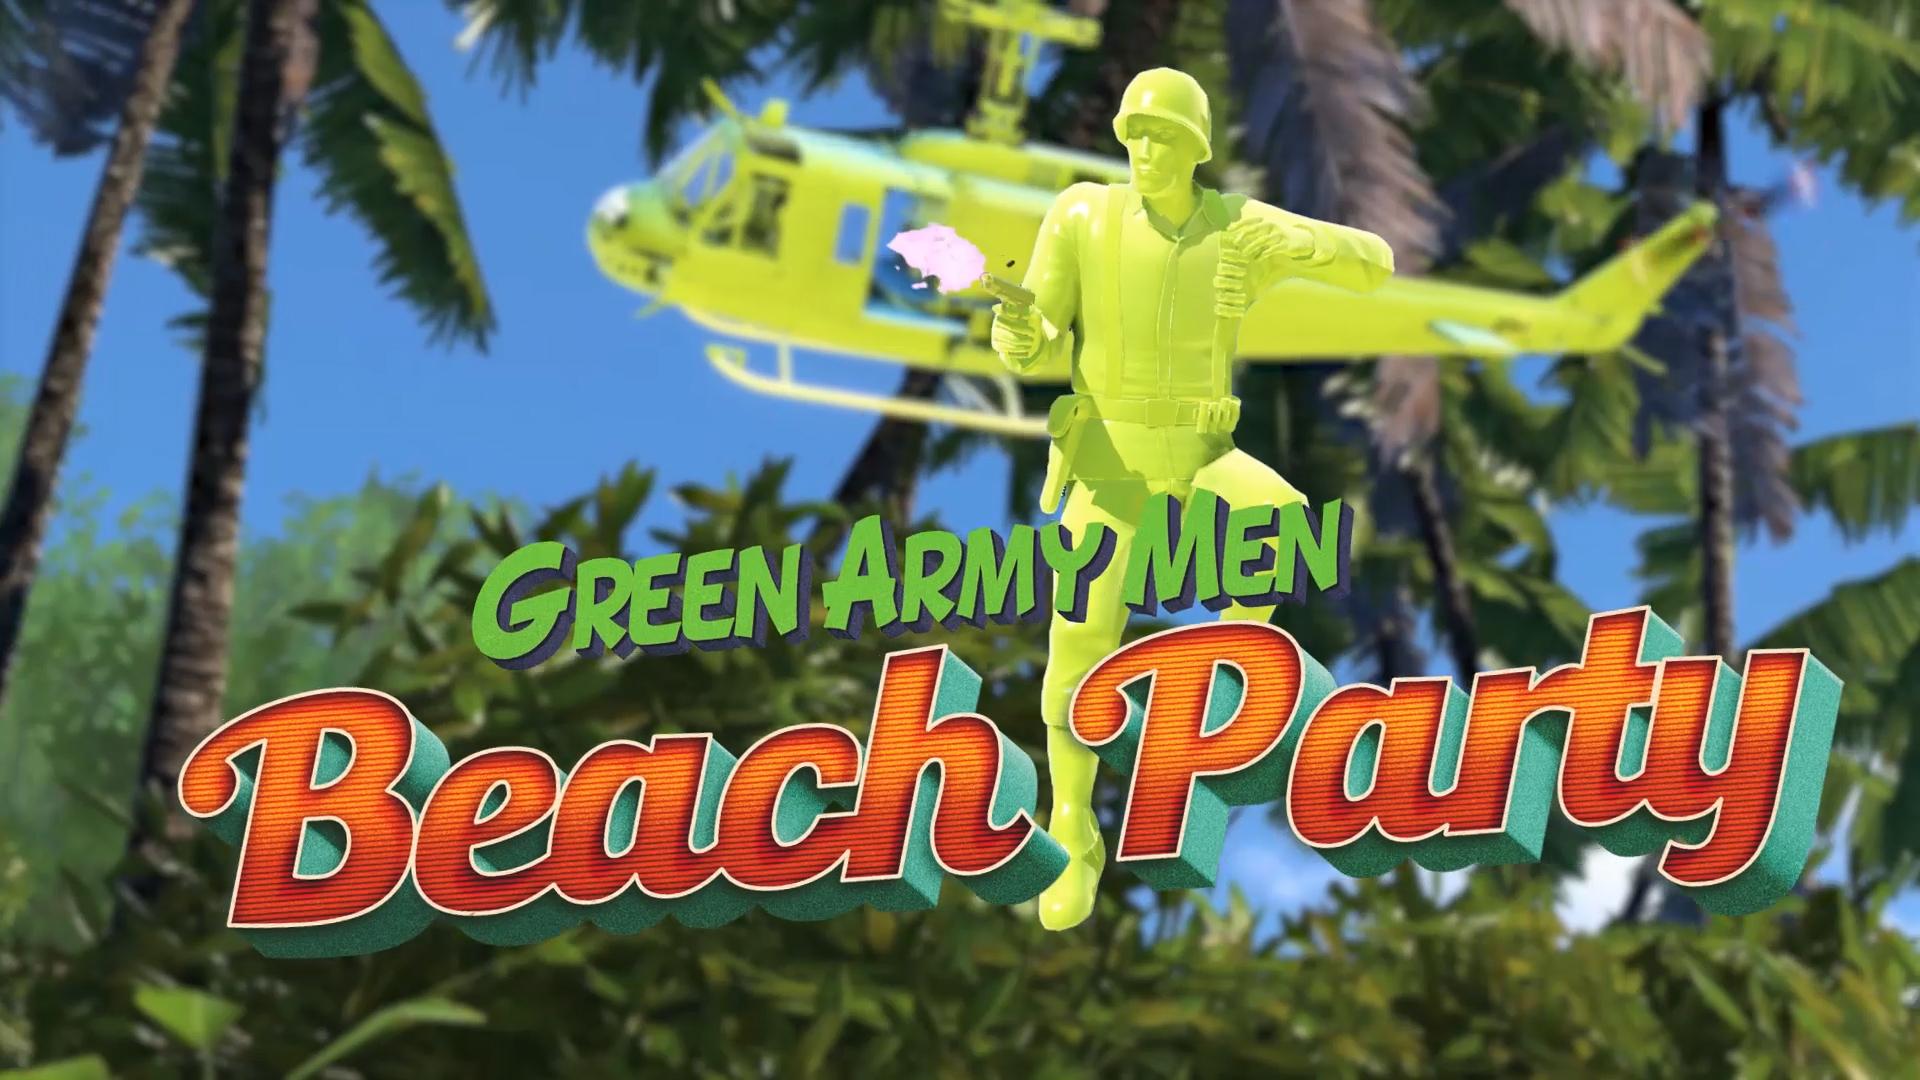 Rising Sotrm 2: Vietnam - Green Army Men